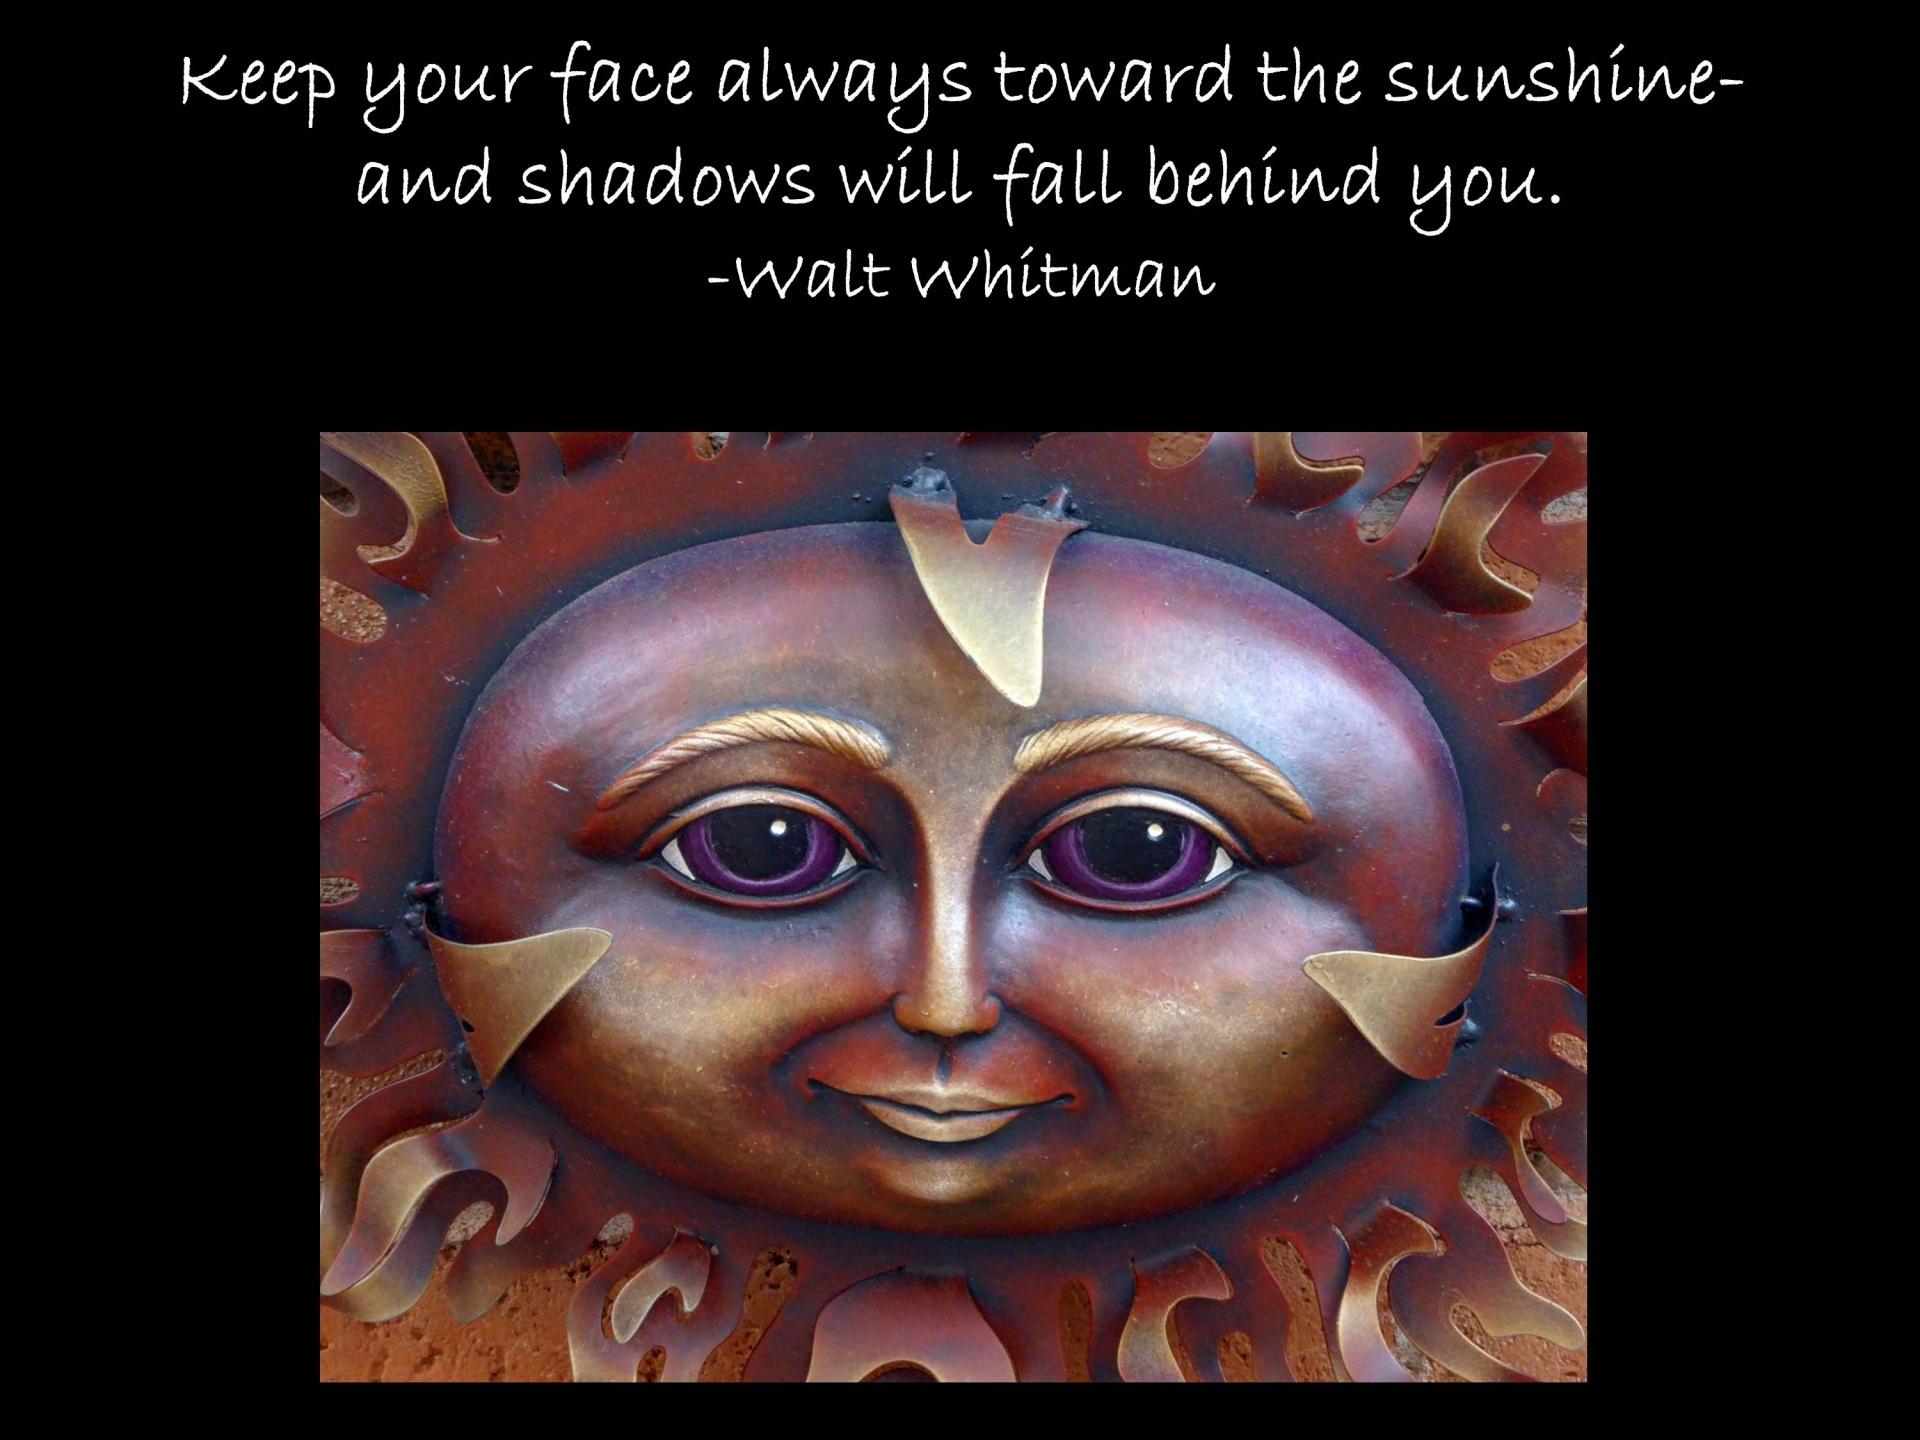 walt whitman, inspirational quotes, encouragement